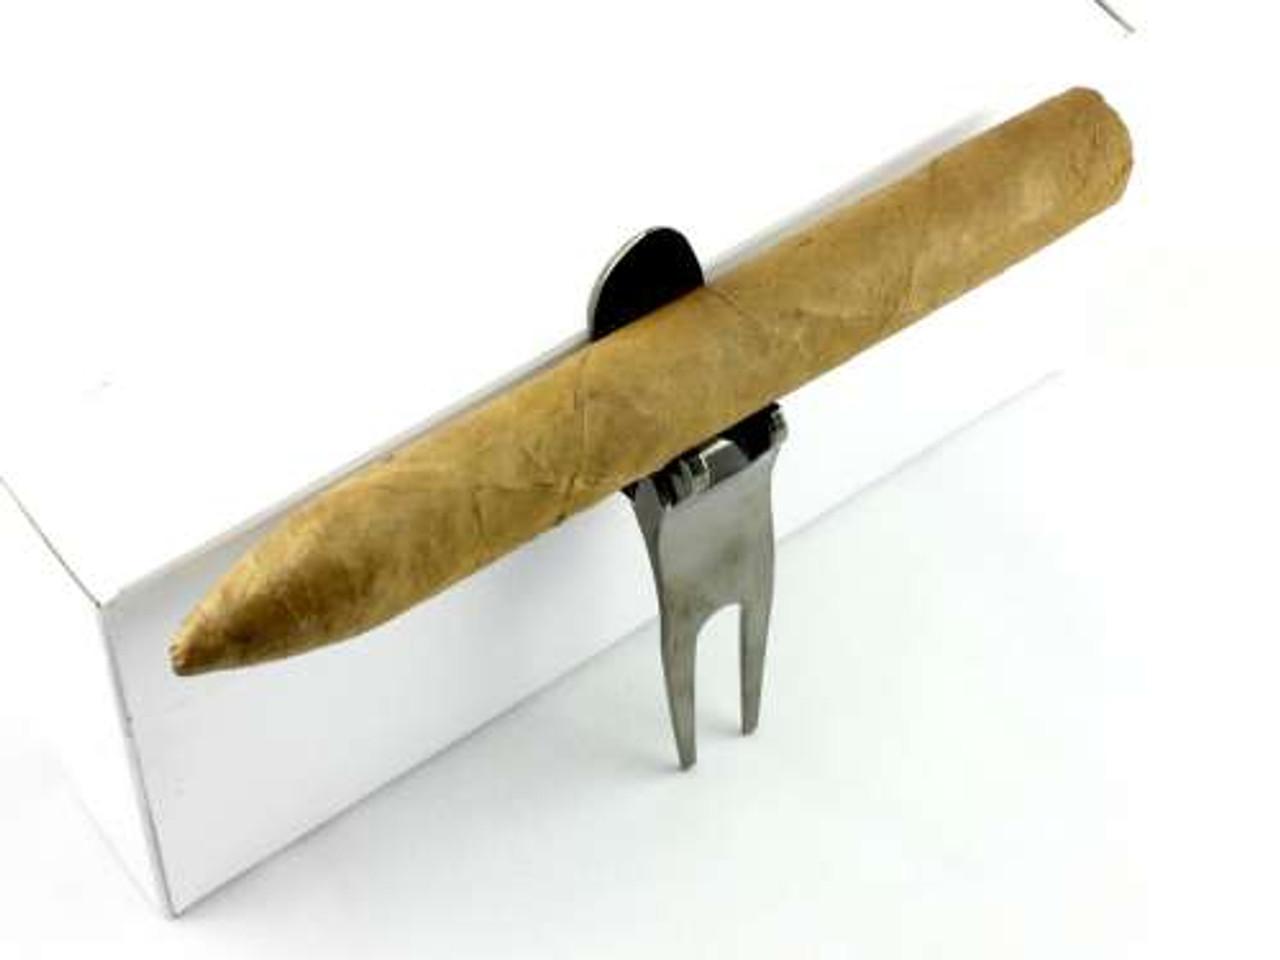 Div-Pro 6 in 1 Cigar Holder Divot Tool